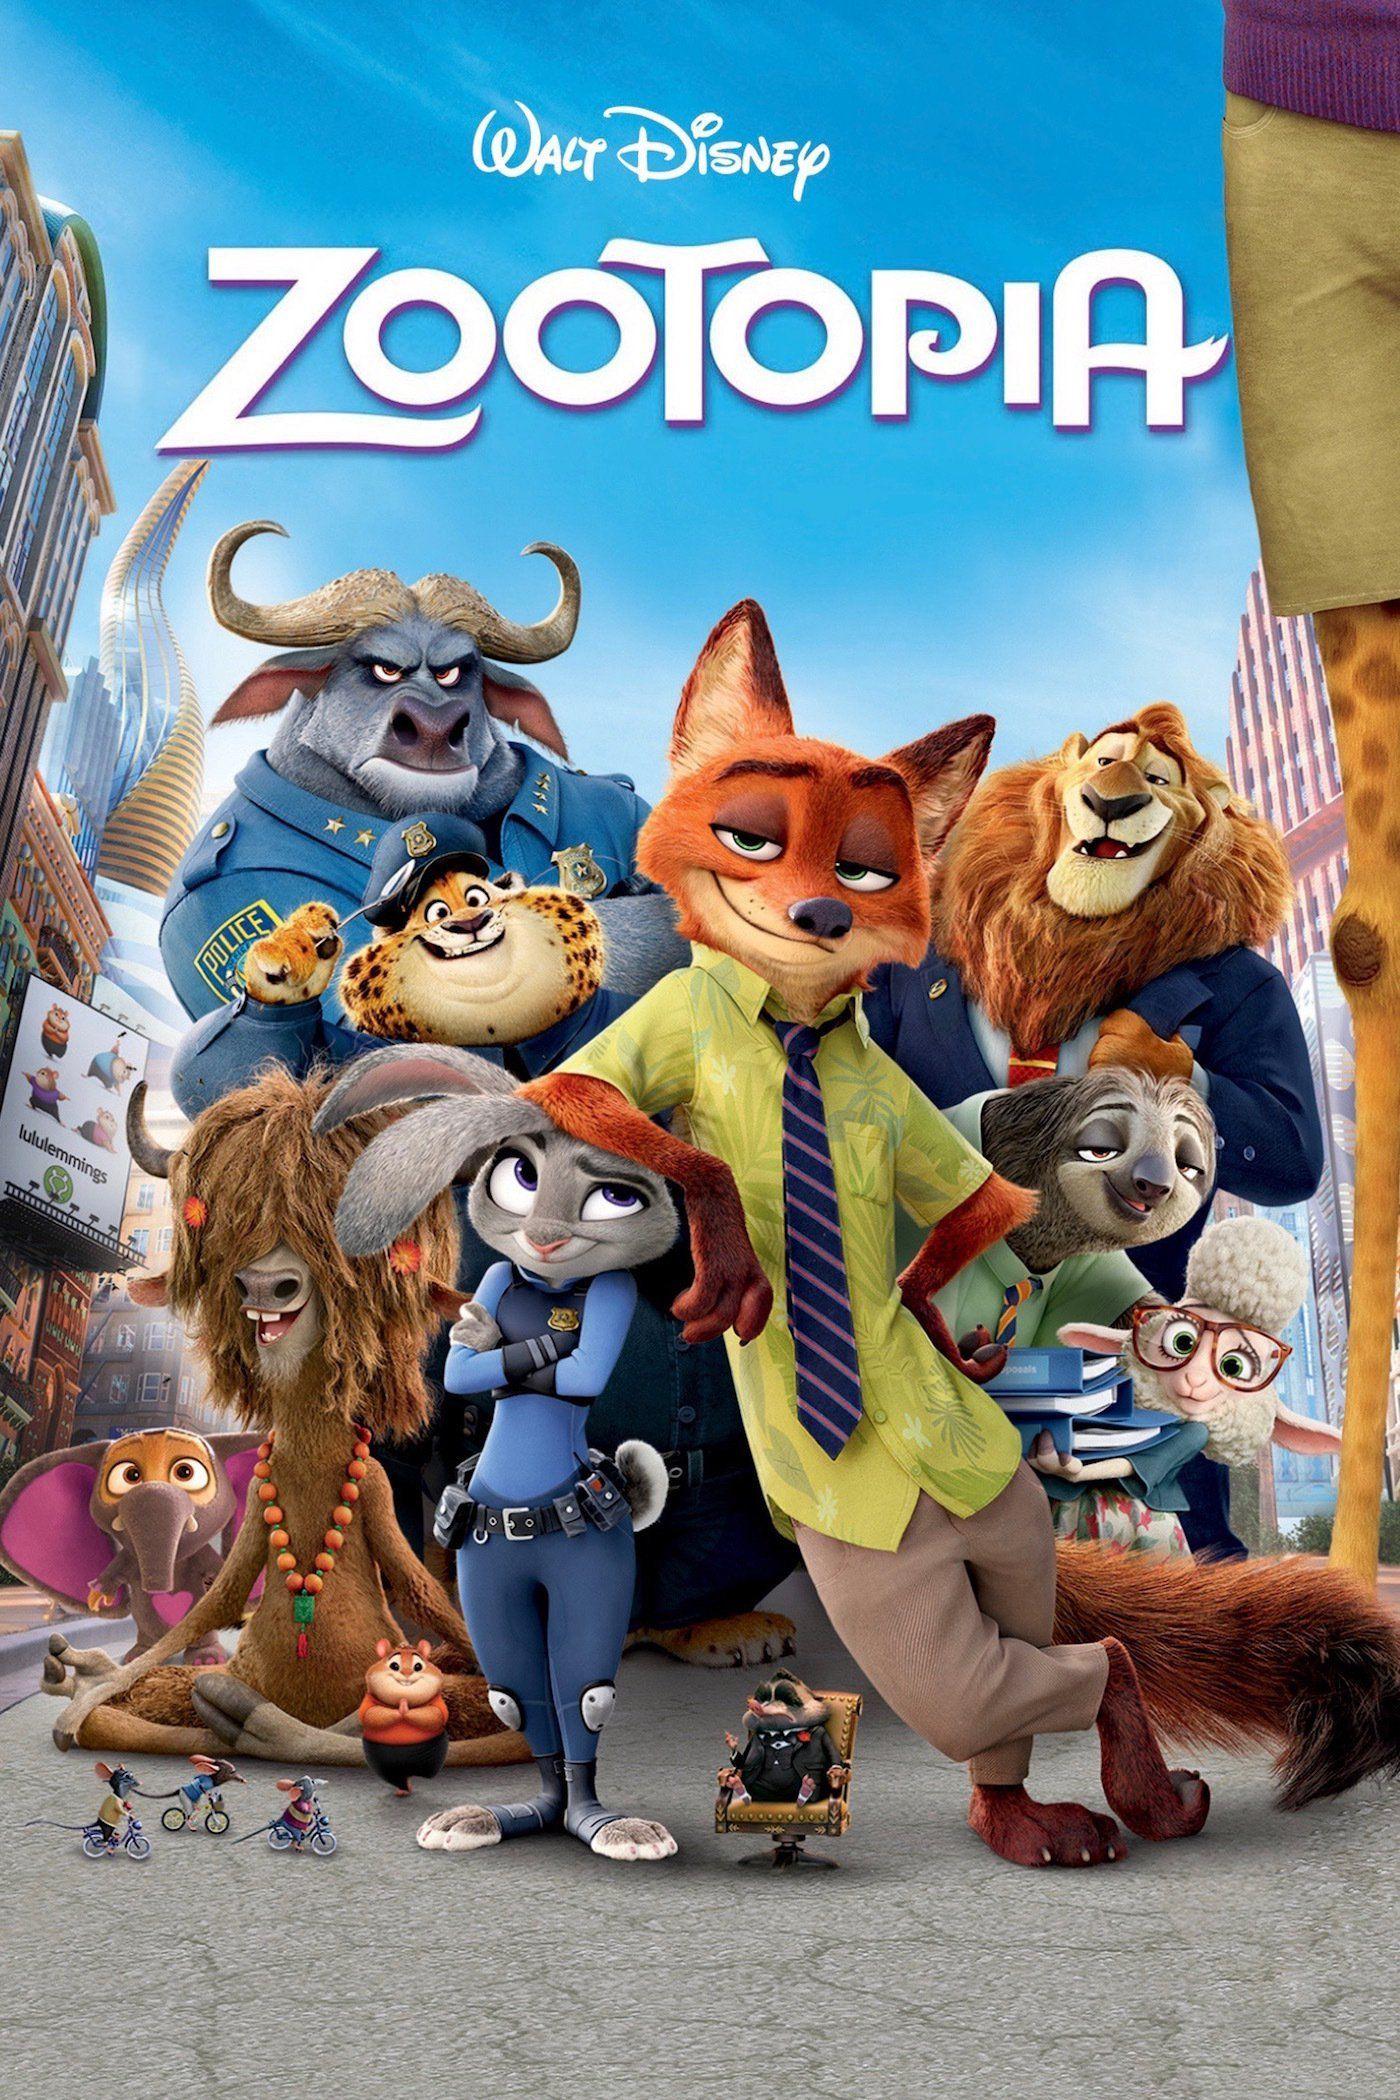 zootopia animated feature film oscar nominees 2017 unh alumni